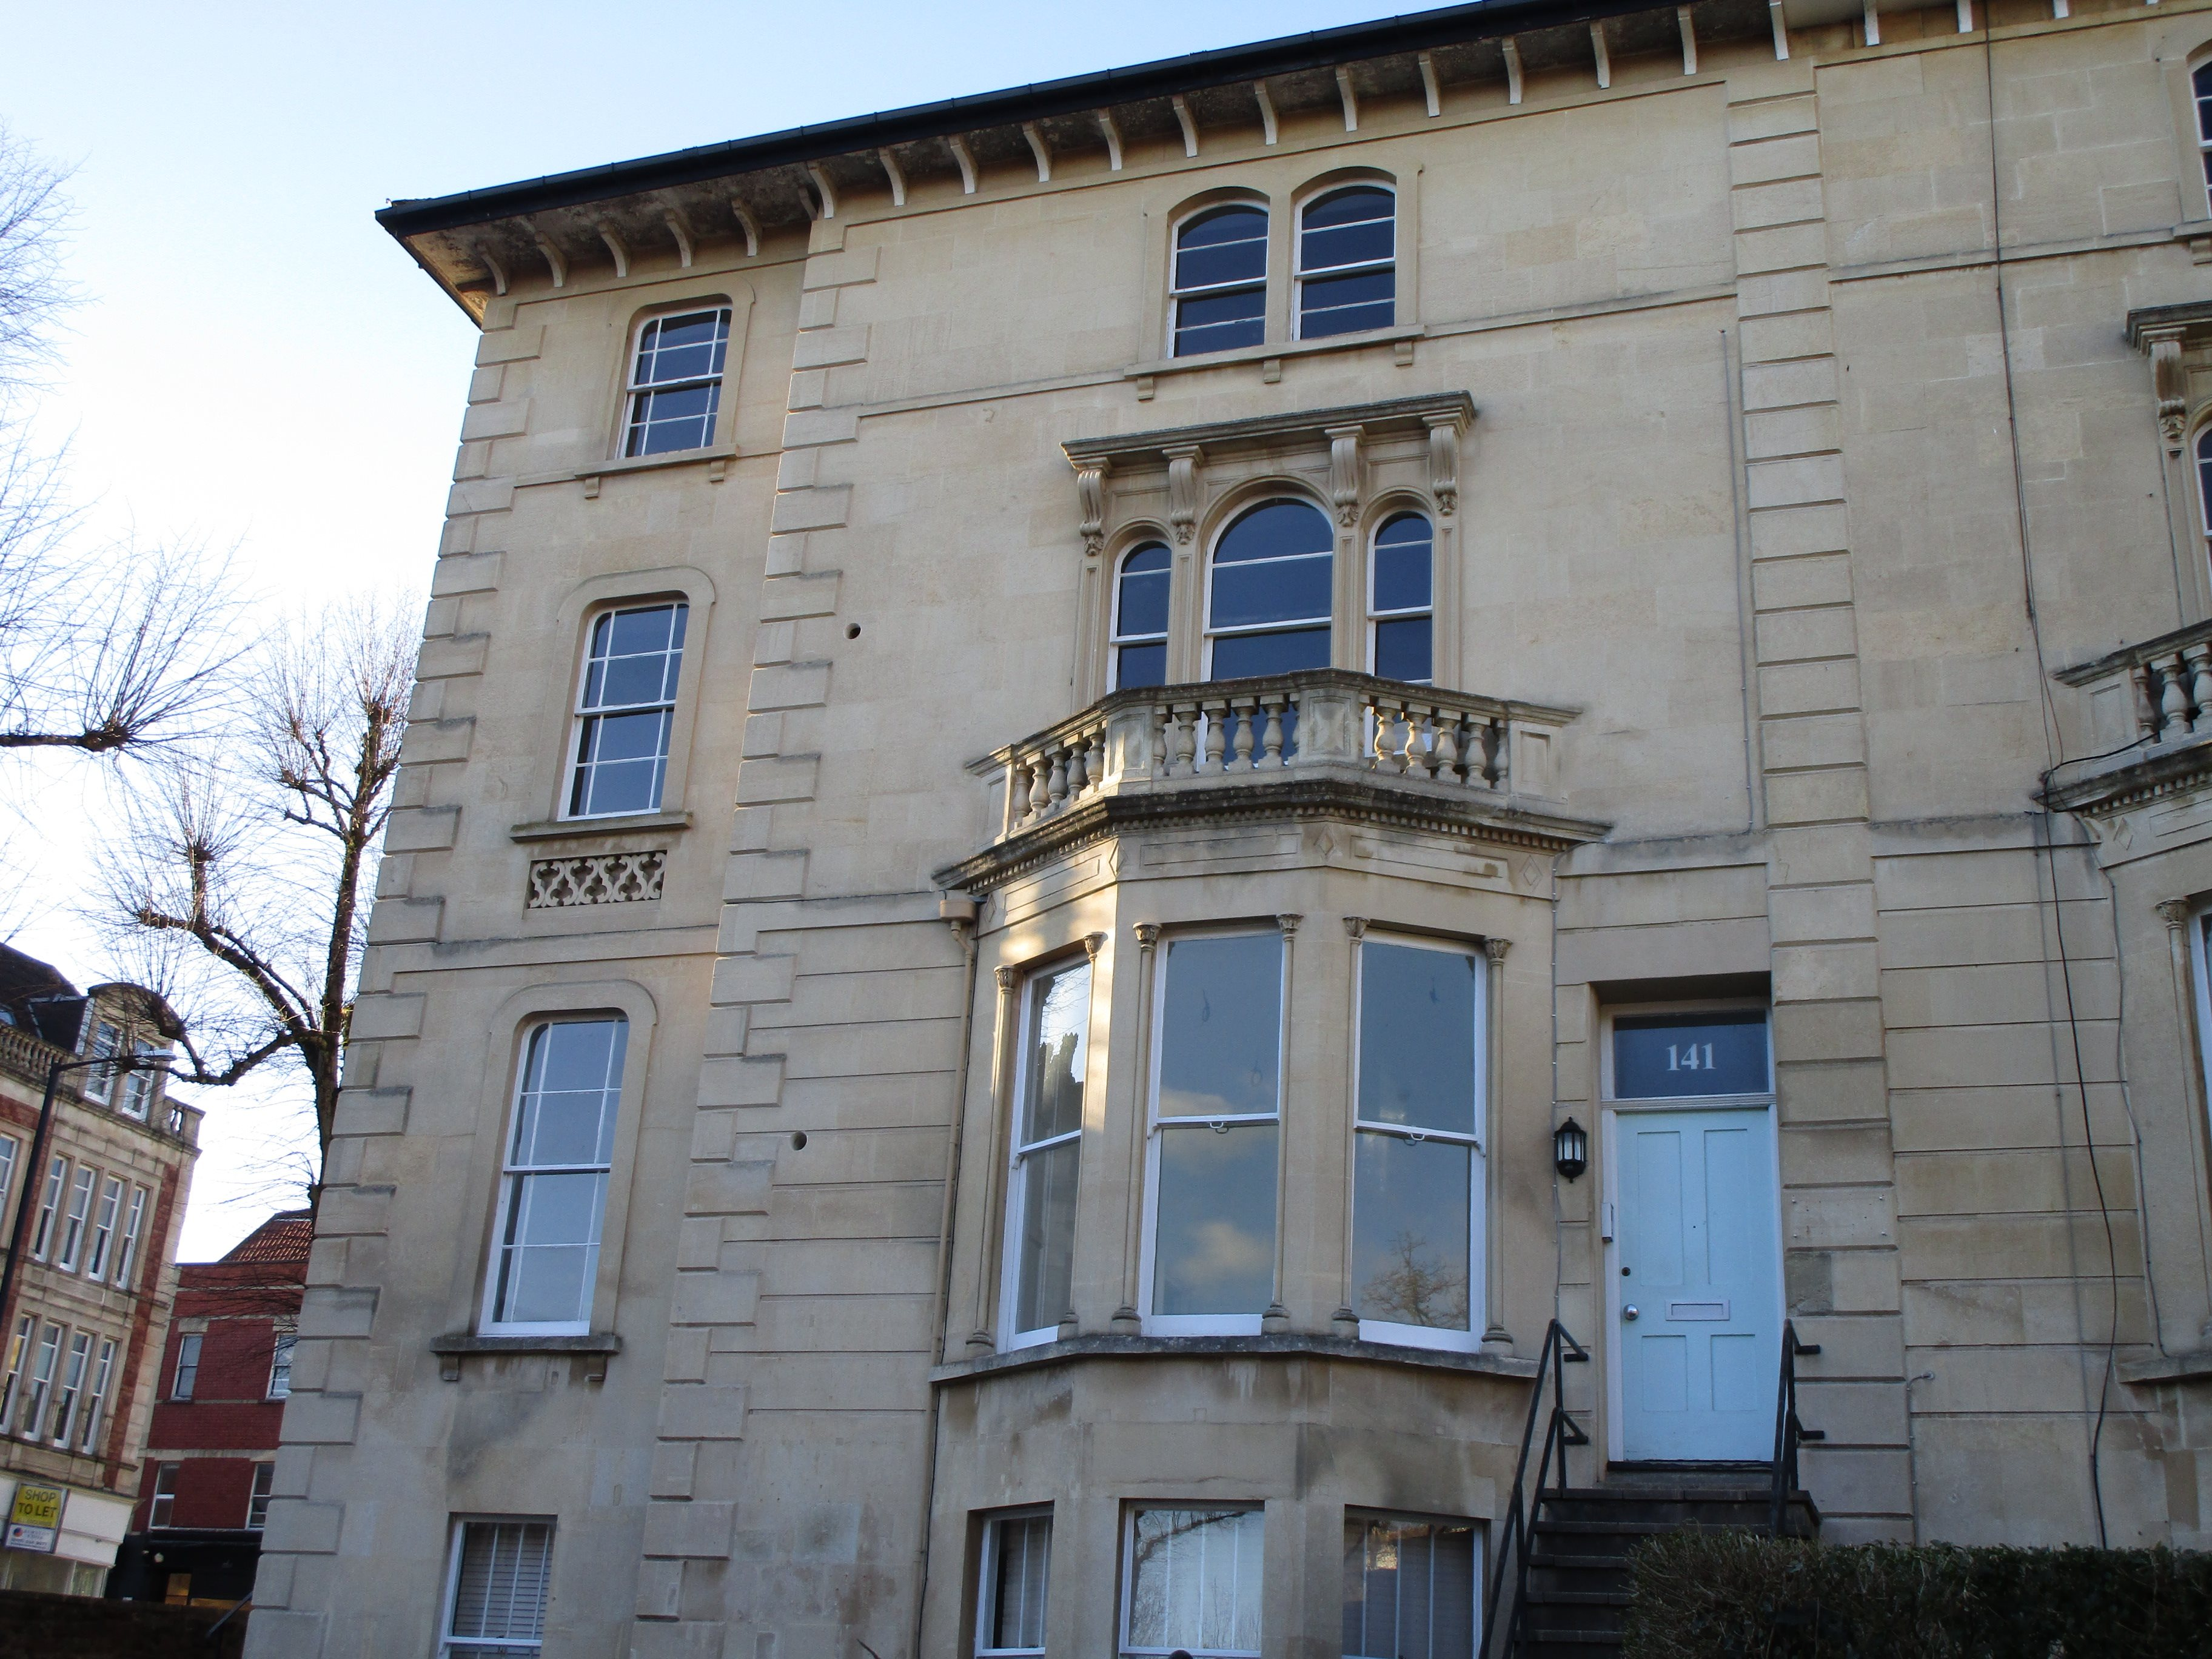 4 bed flat to rent in Whiteladies Road, Redland - Property Image 1